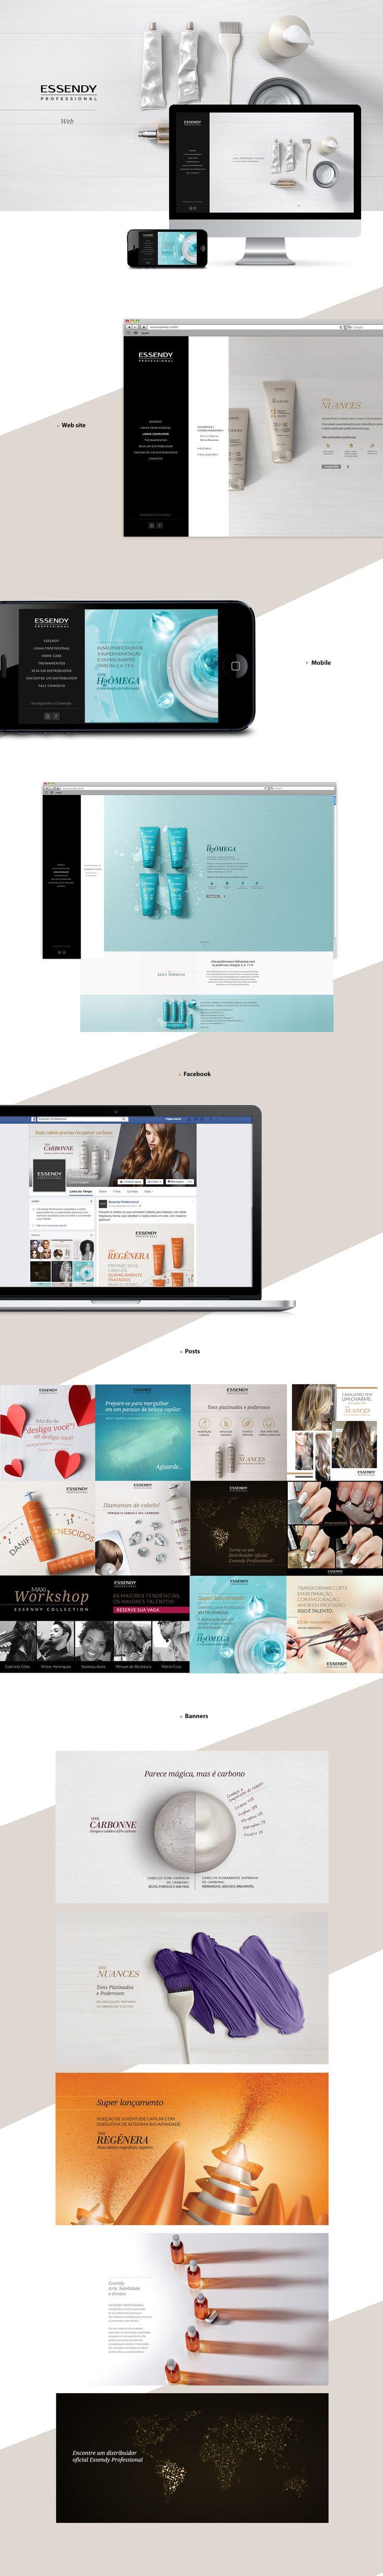 ID. Essendy Professional Web / Facebook on Behance